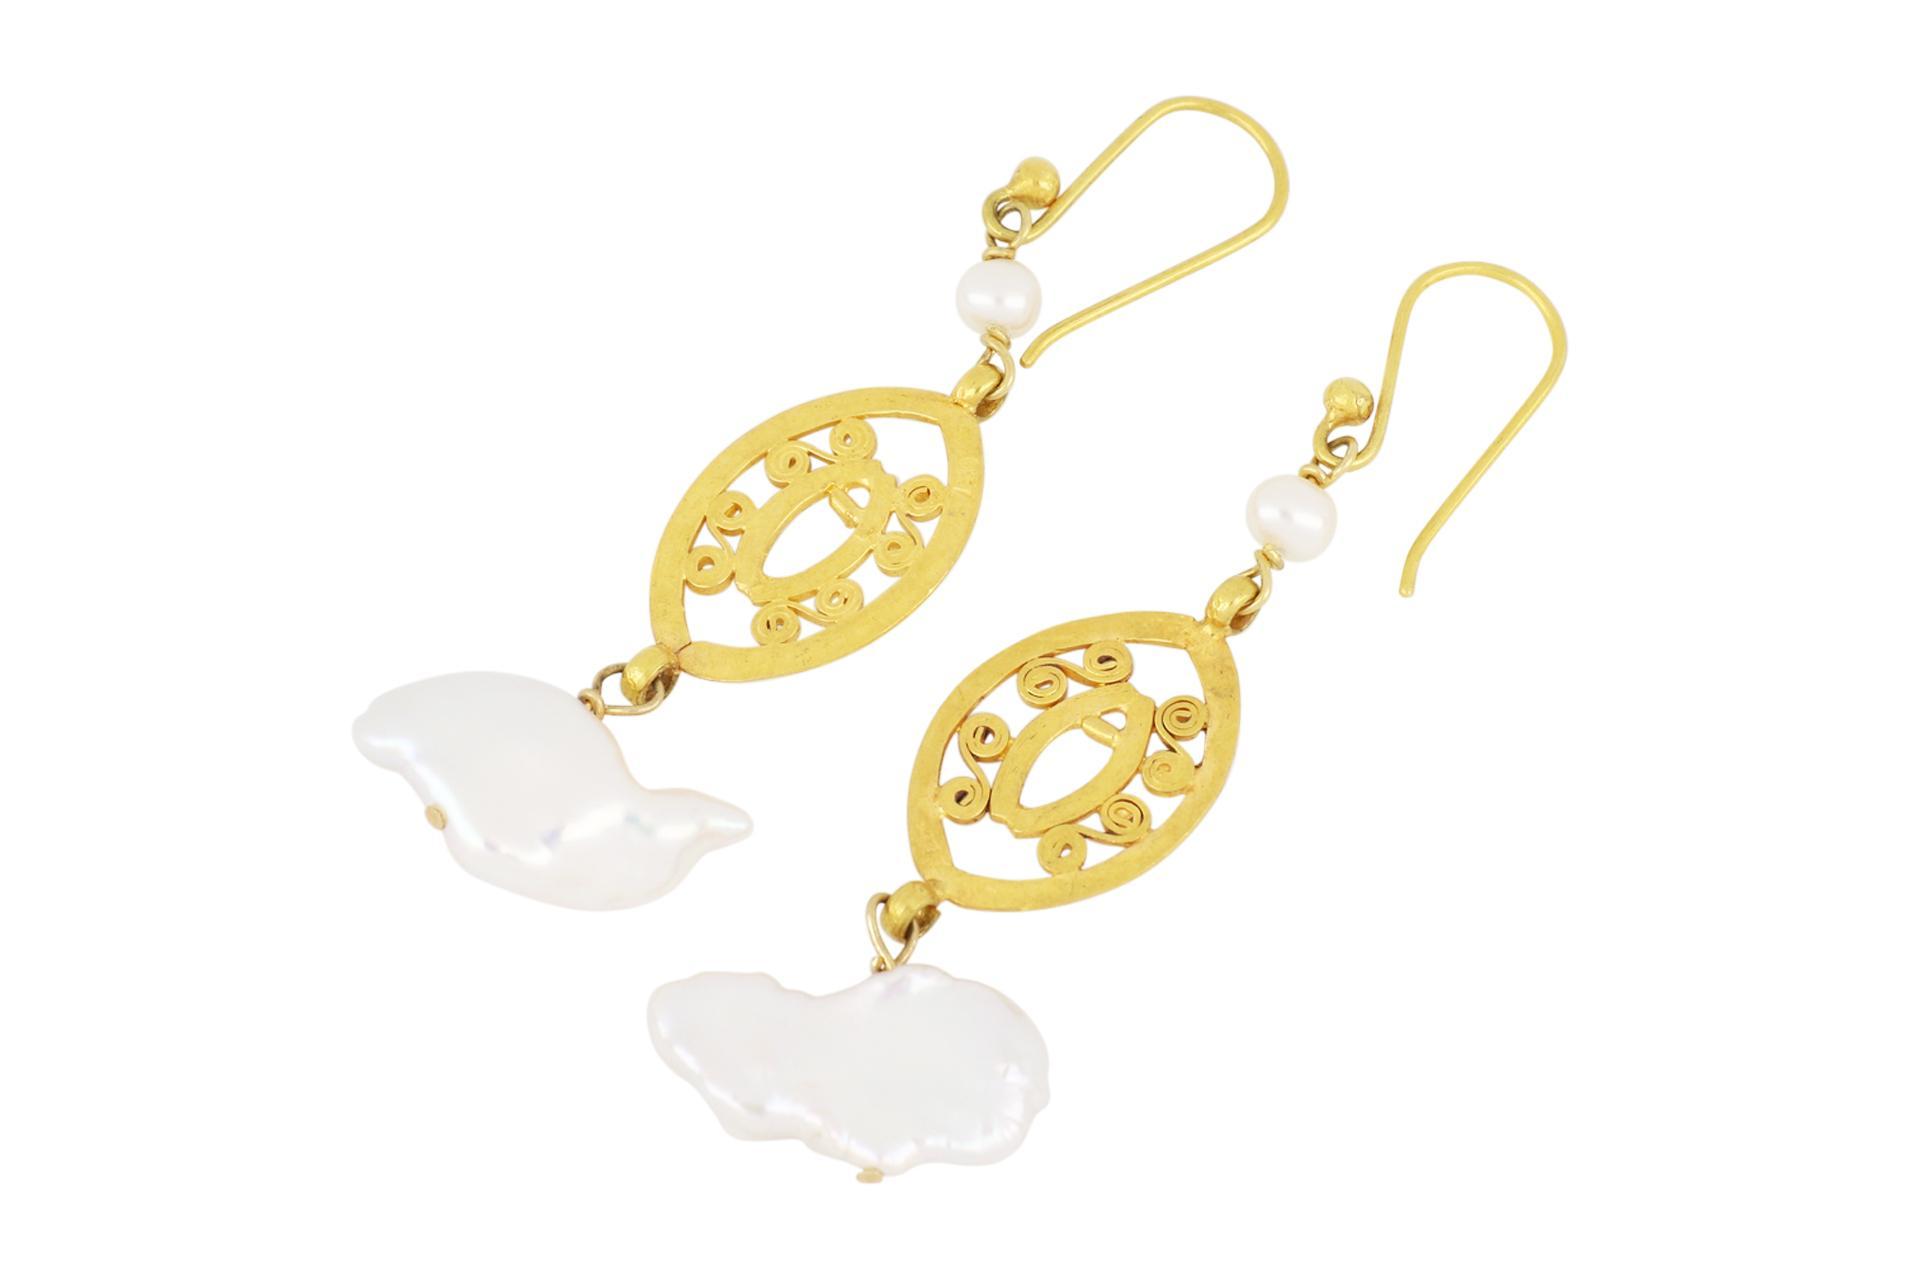 Pair of 18ct yellow gold & Keshi pearl drop earrings